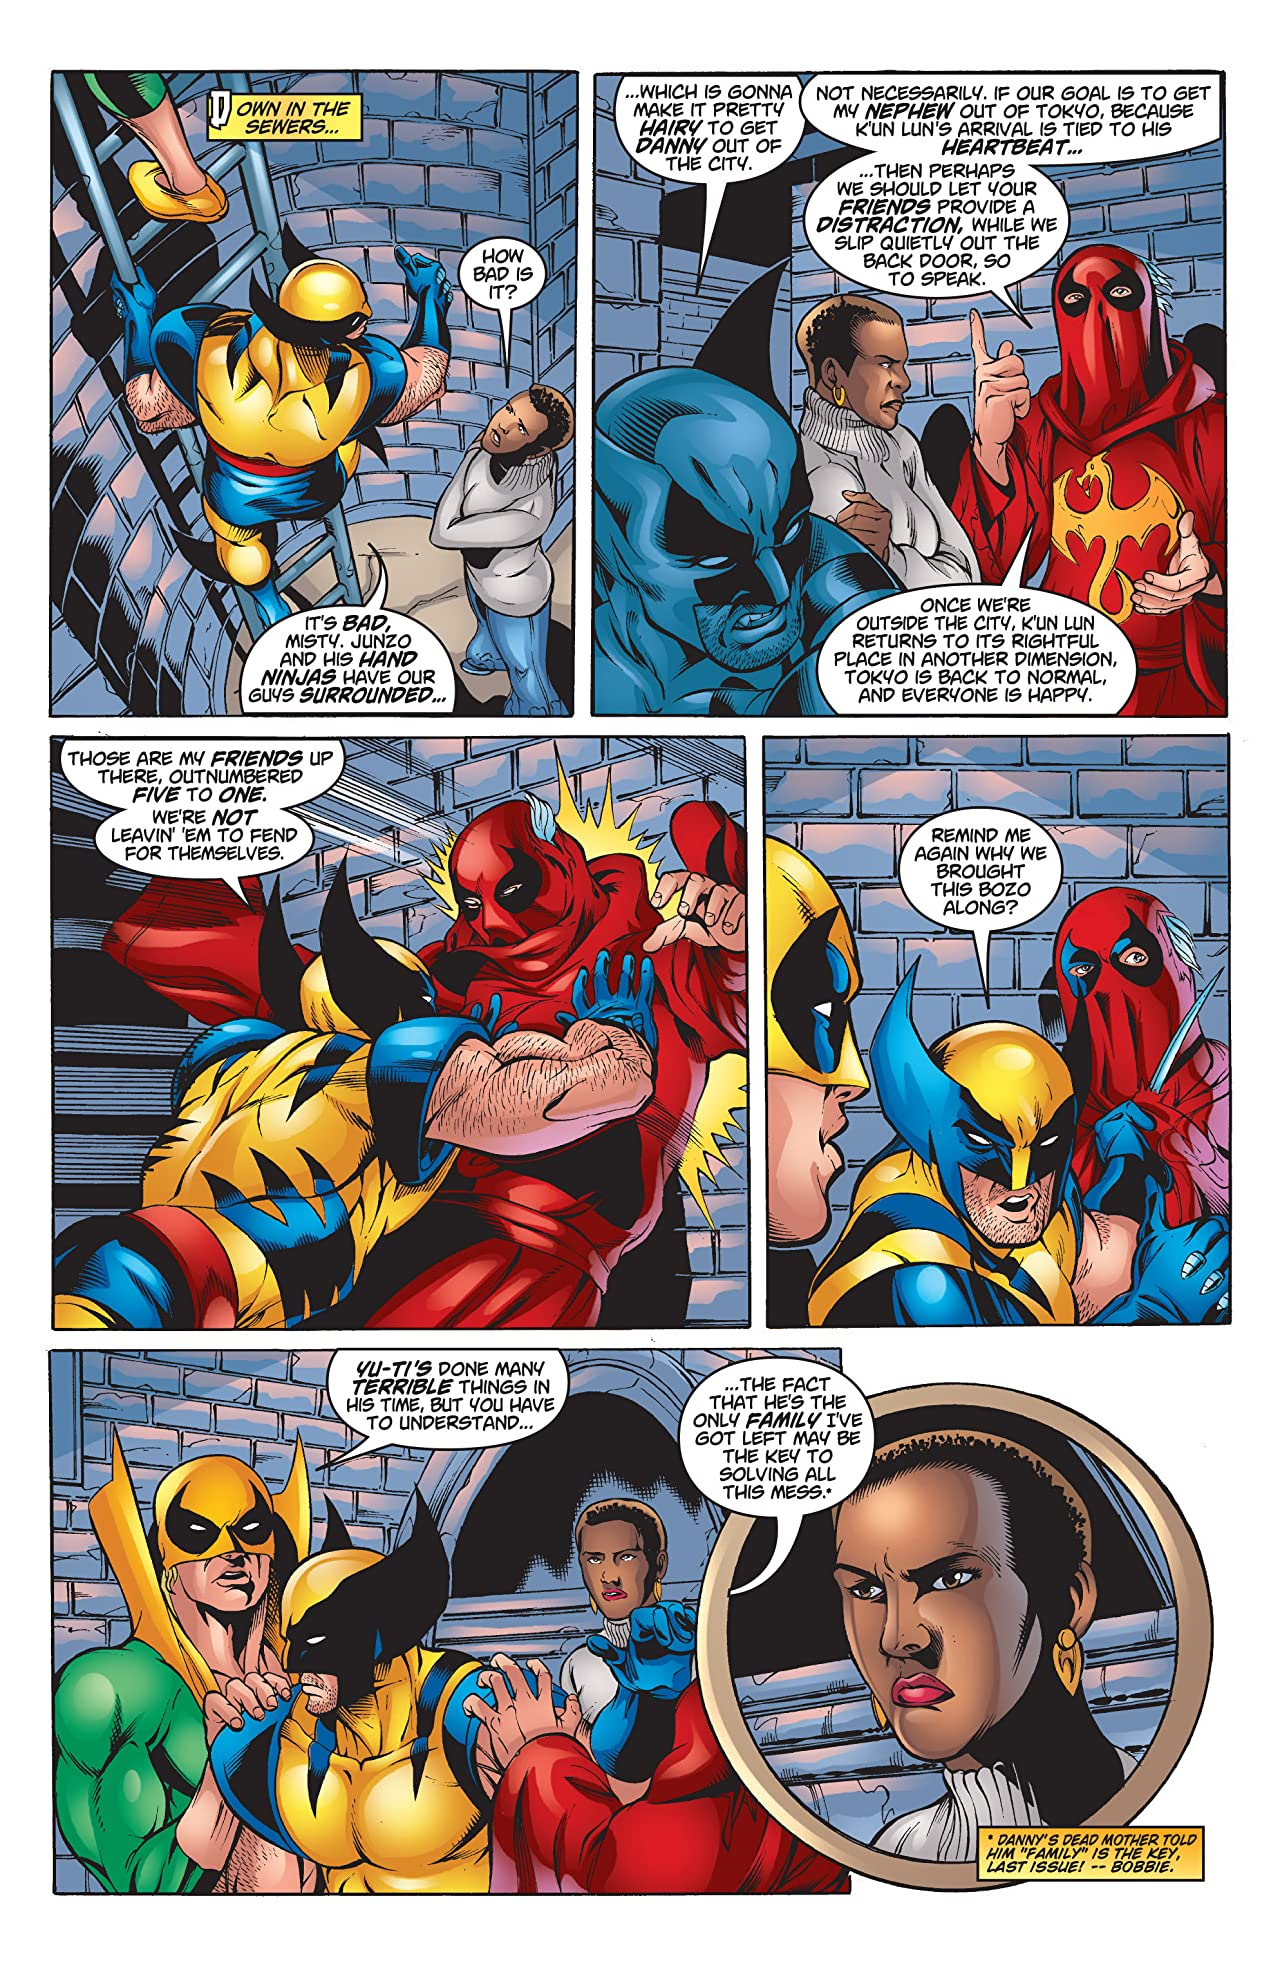 Iron Fist/Wolverine (2000-2001) #4 (of 4)